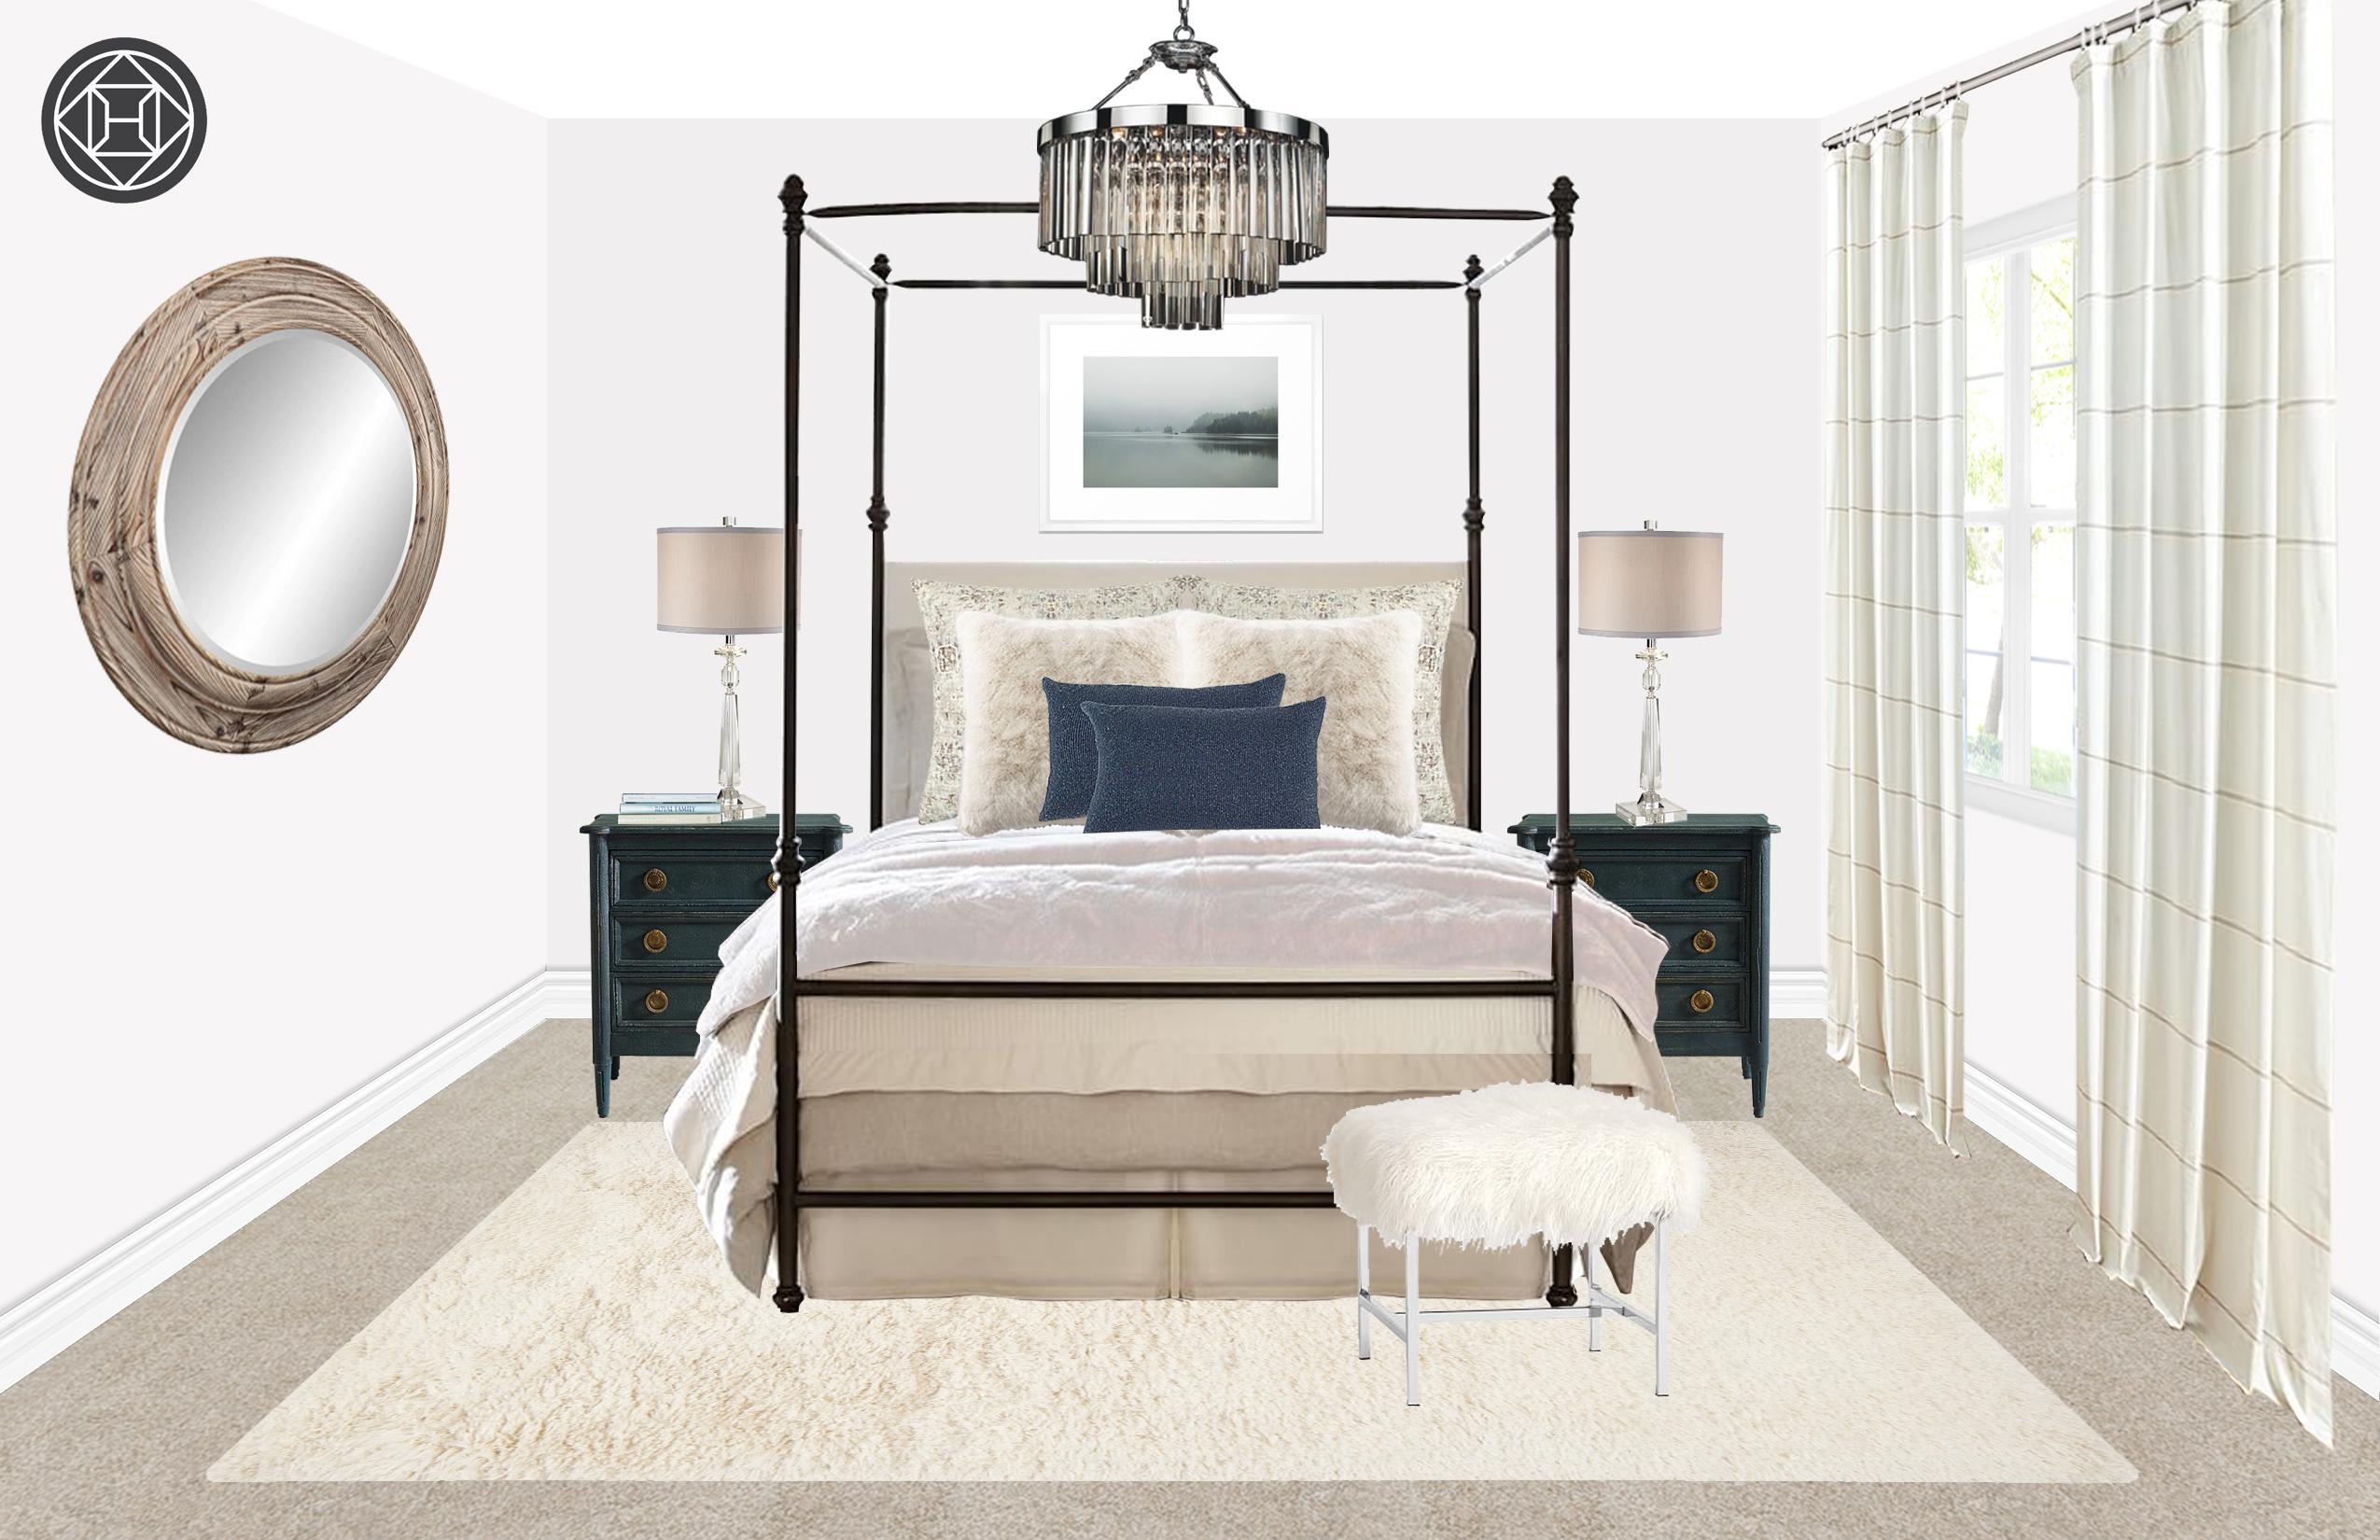 modern, glam, rustic bedroom designhavenly interior designerjill